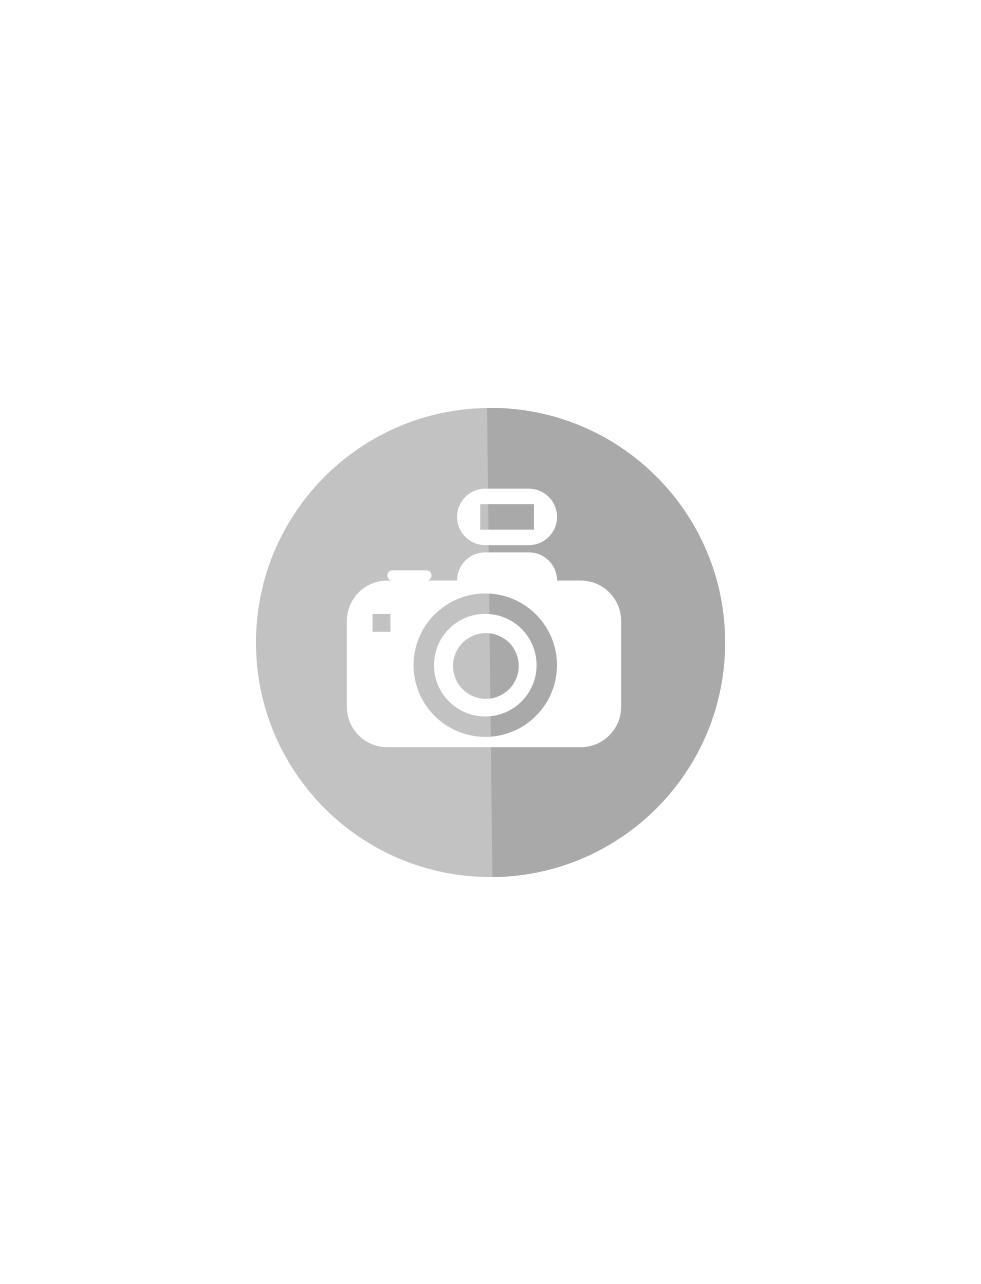 30640745_sparepart/Schule-Wand 190x150